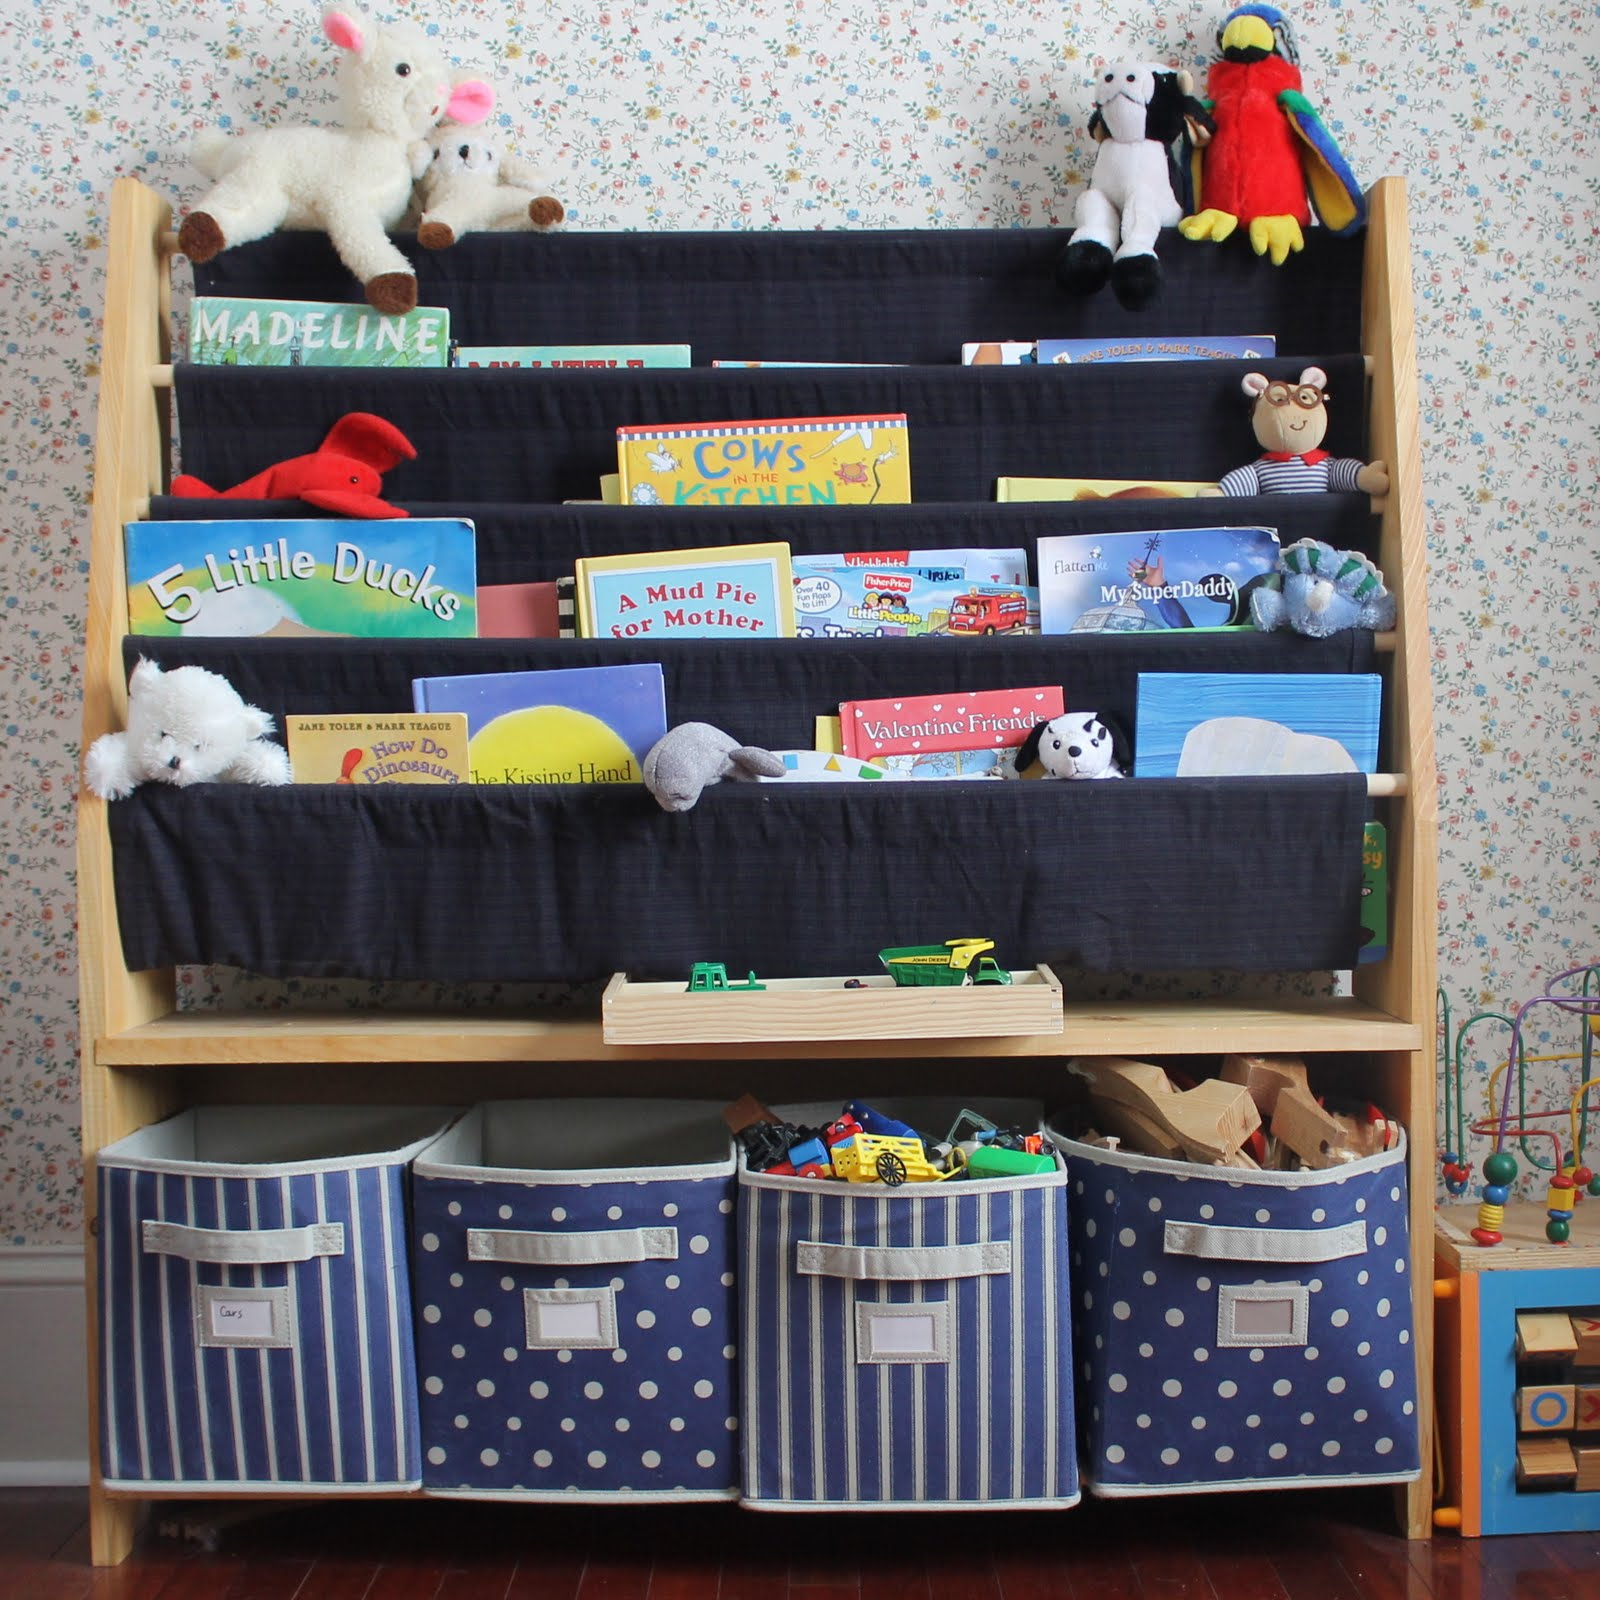 Born Imaginative Sling Bookshelf With Storage Bins For Kids